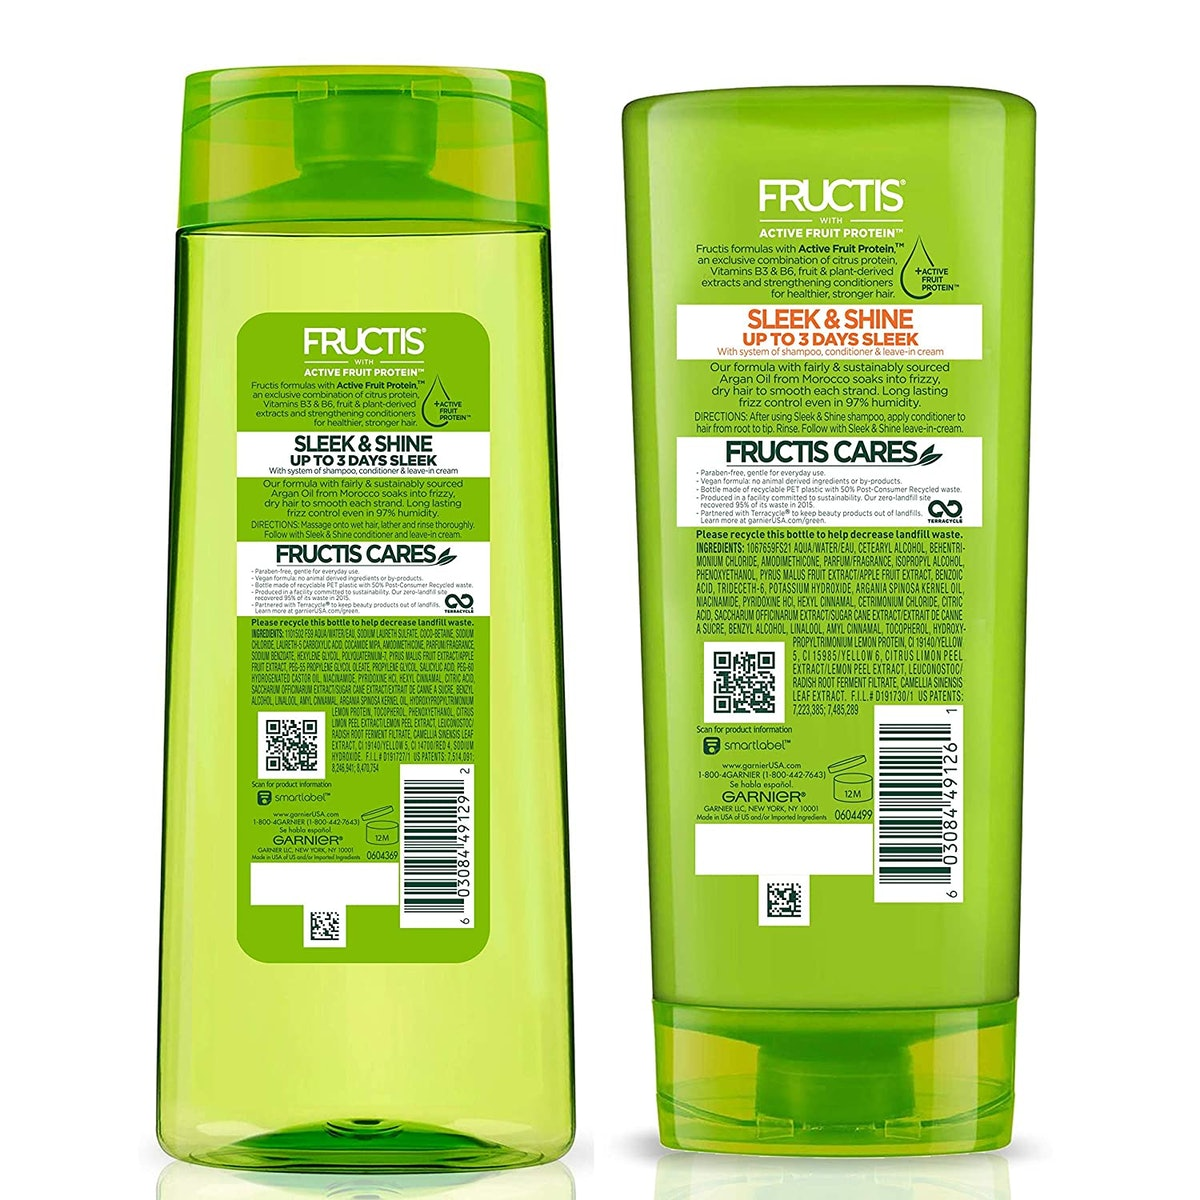 Garnier Fructis Sleek and Shine Shampoo & Conditioner